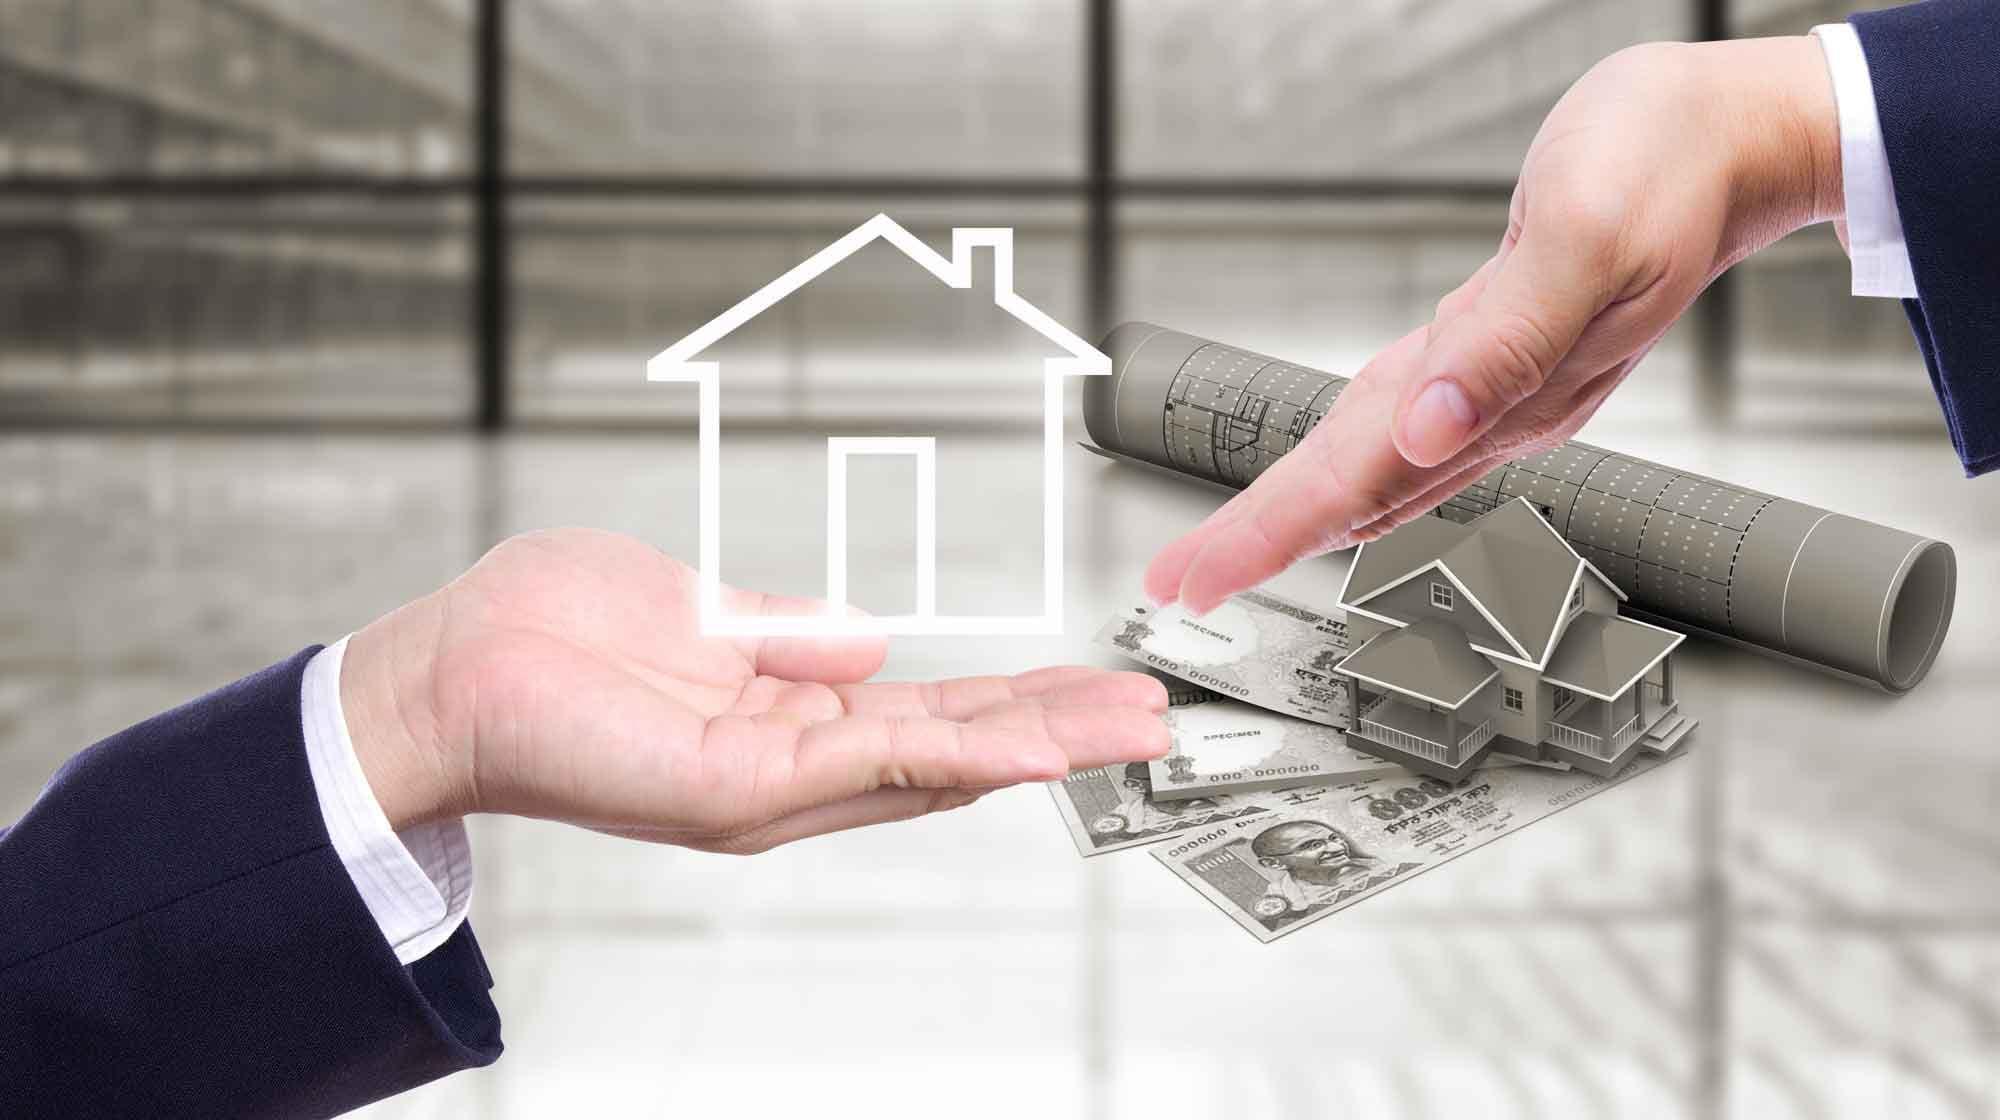 мог рефинансирование ипотеки на дома Отлично миг